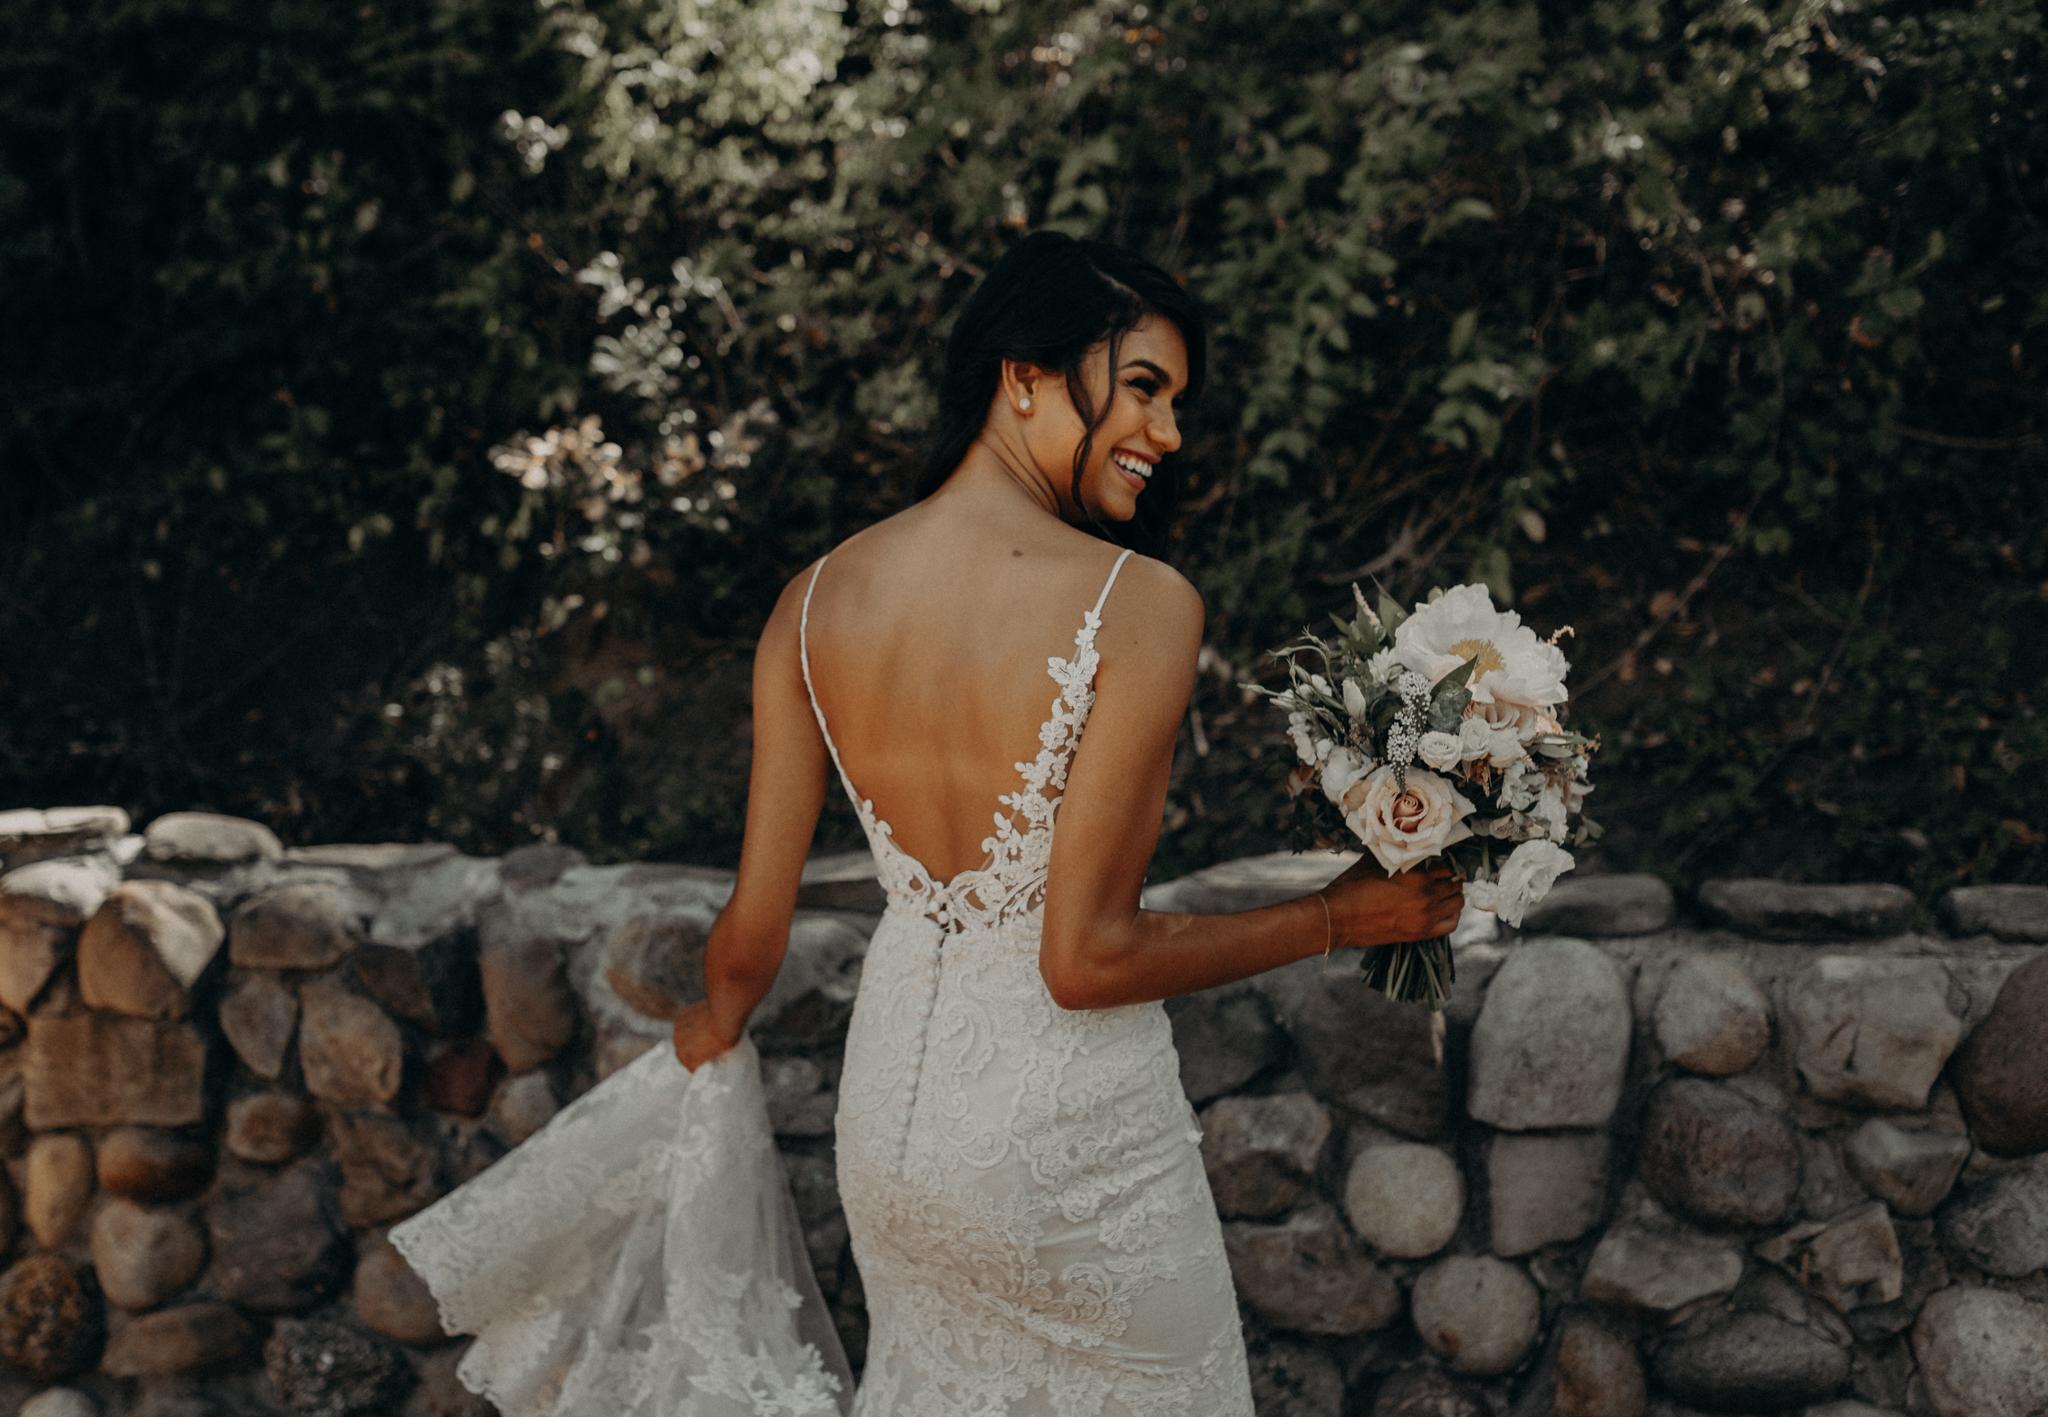 Isaiah + Taylor Photography - Rancho Las Lomas Wedding, Los Angeles Wedding Photographer-030.jpg